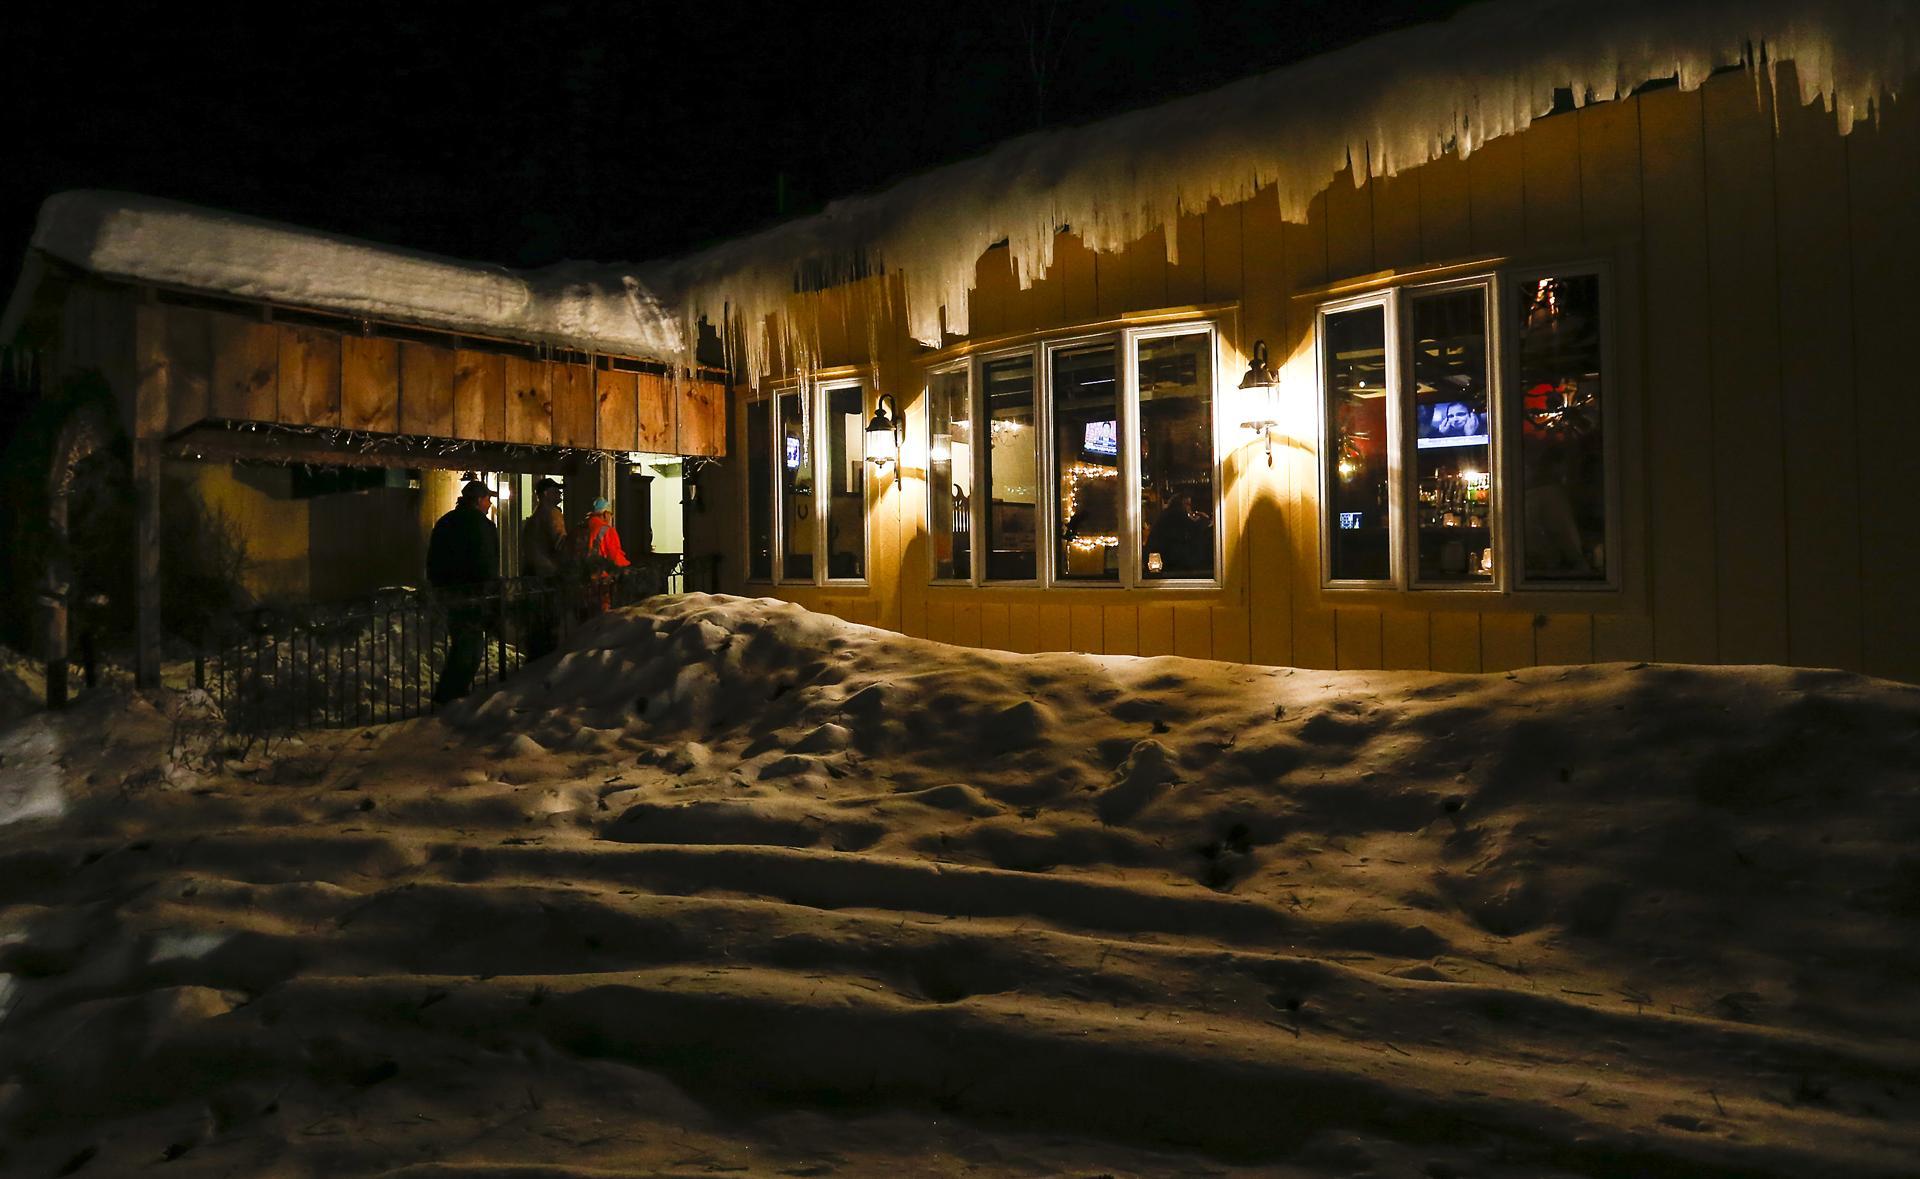 Reality TV turns around a struggling N H restaurant The Boston